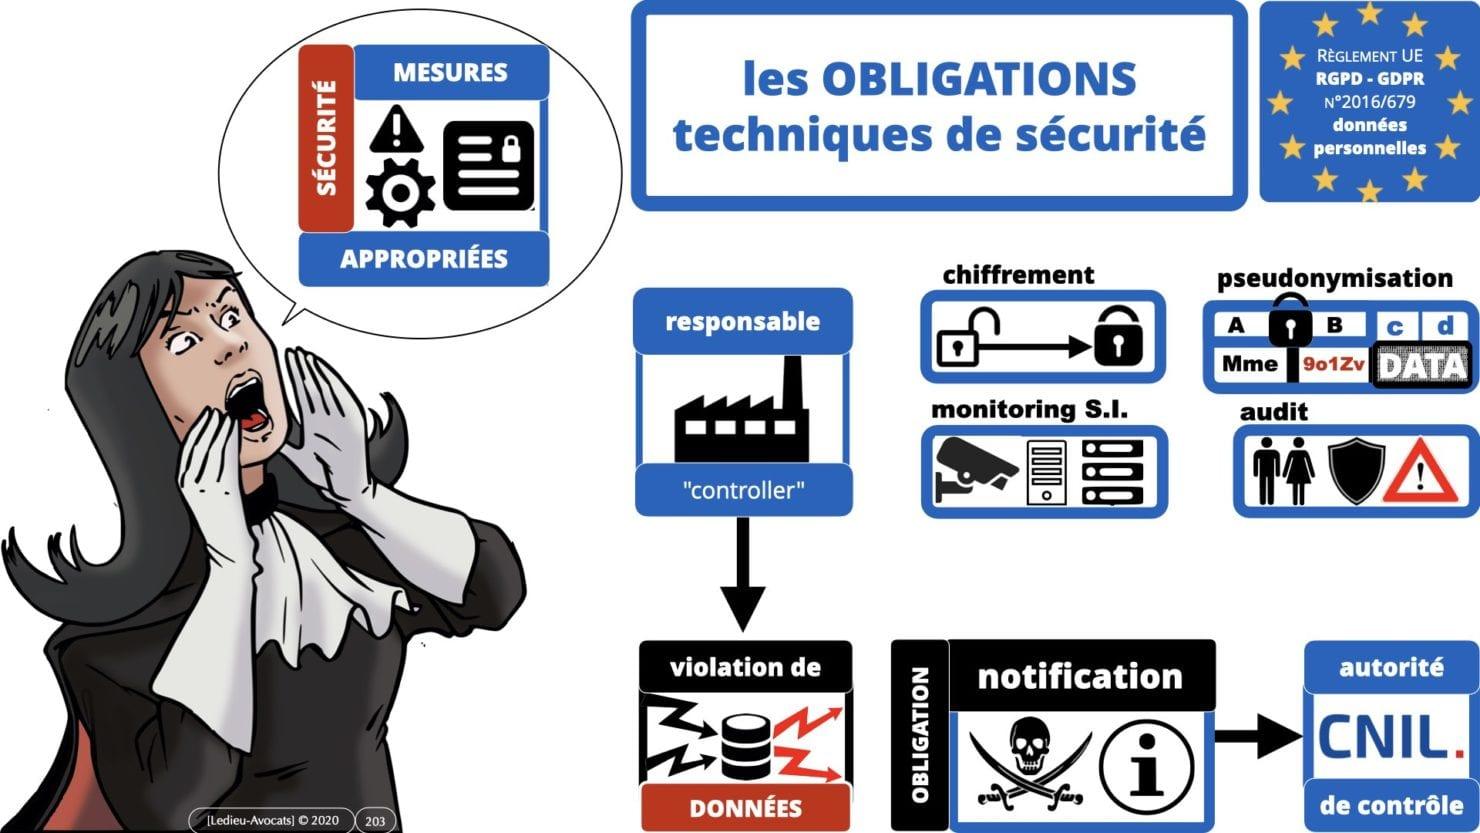 RGPD e-Privacy principes actualité jurisprudence ©Ledieu-Avocats 25-06-2021.203